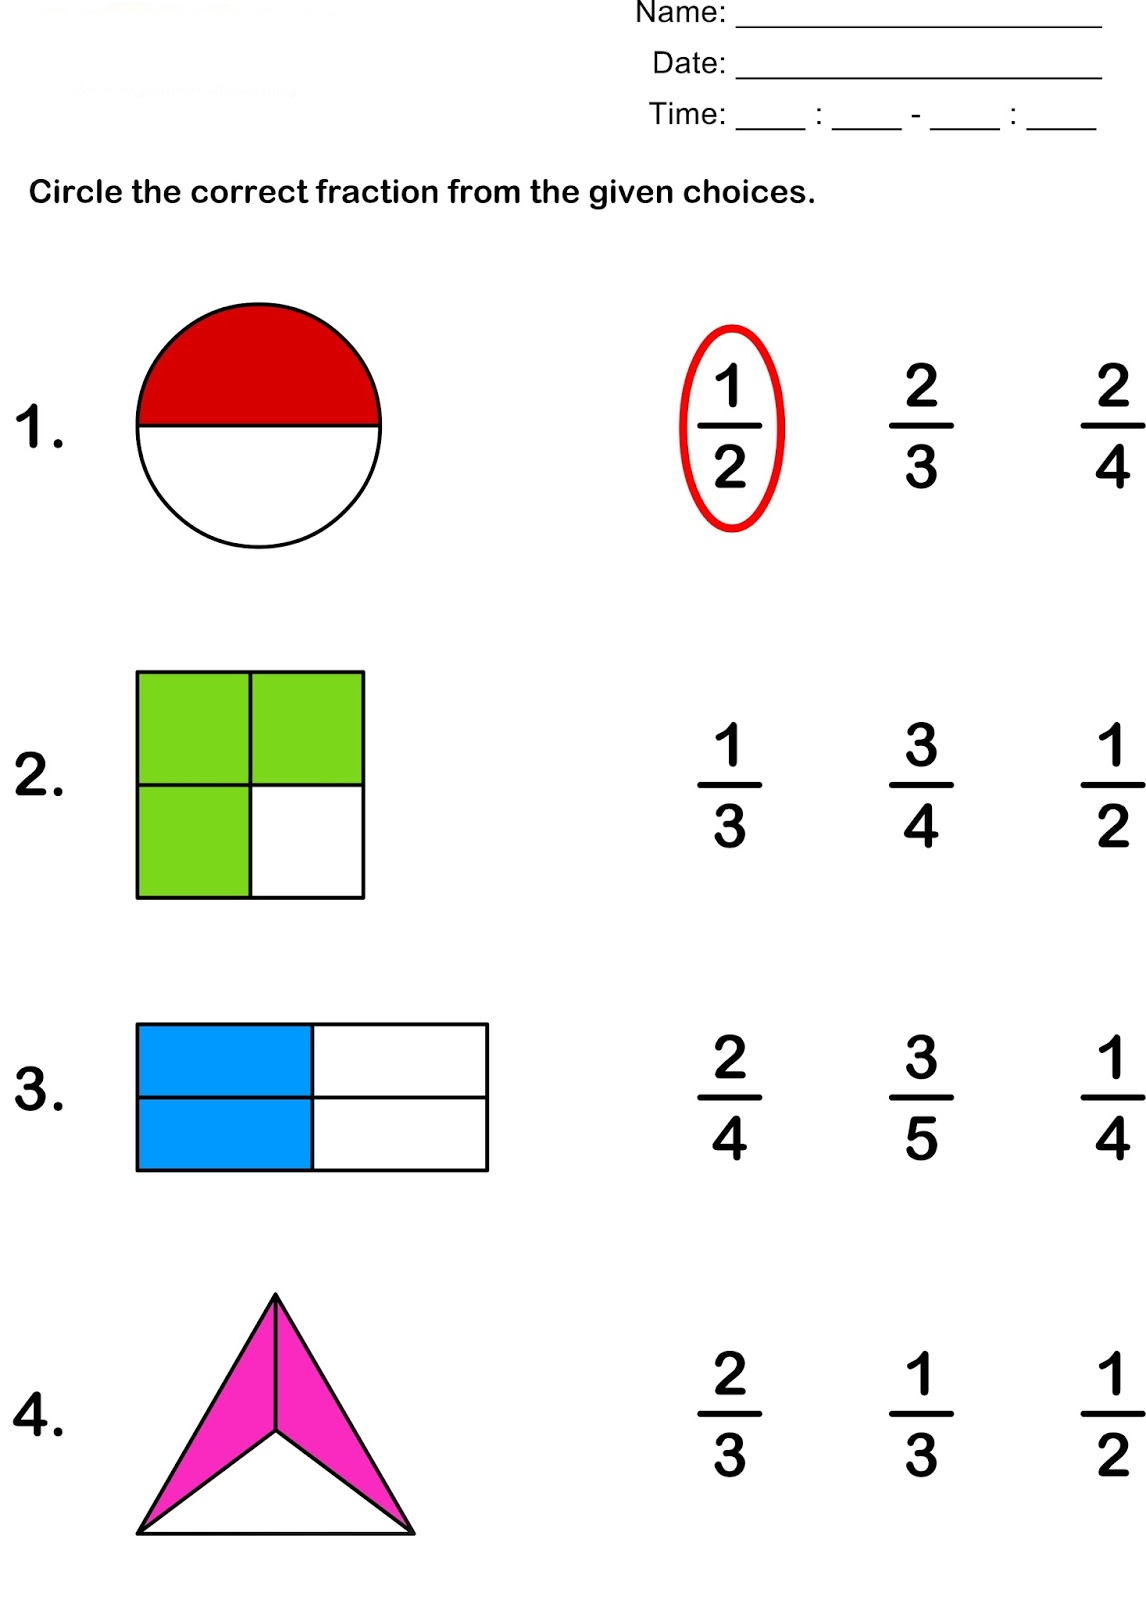 Worksheet For Grade 5 Araling Panlipunan   Printable Worksheets and  Activities for Teachers [ 1600 x 1146 Pixel ]